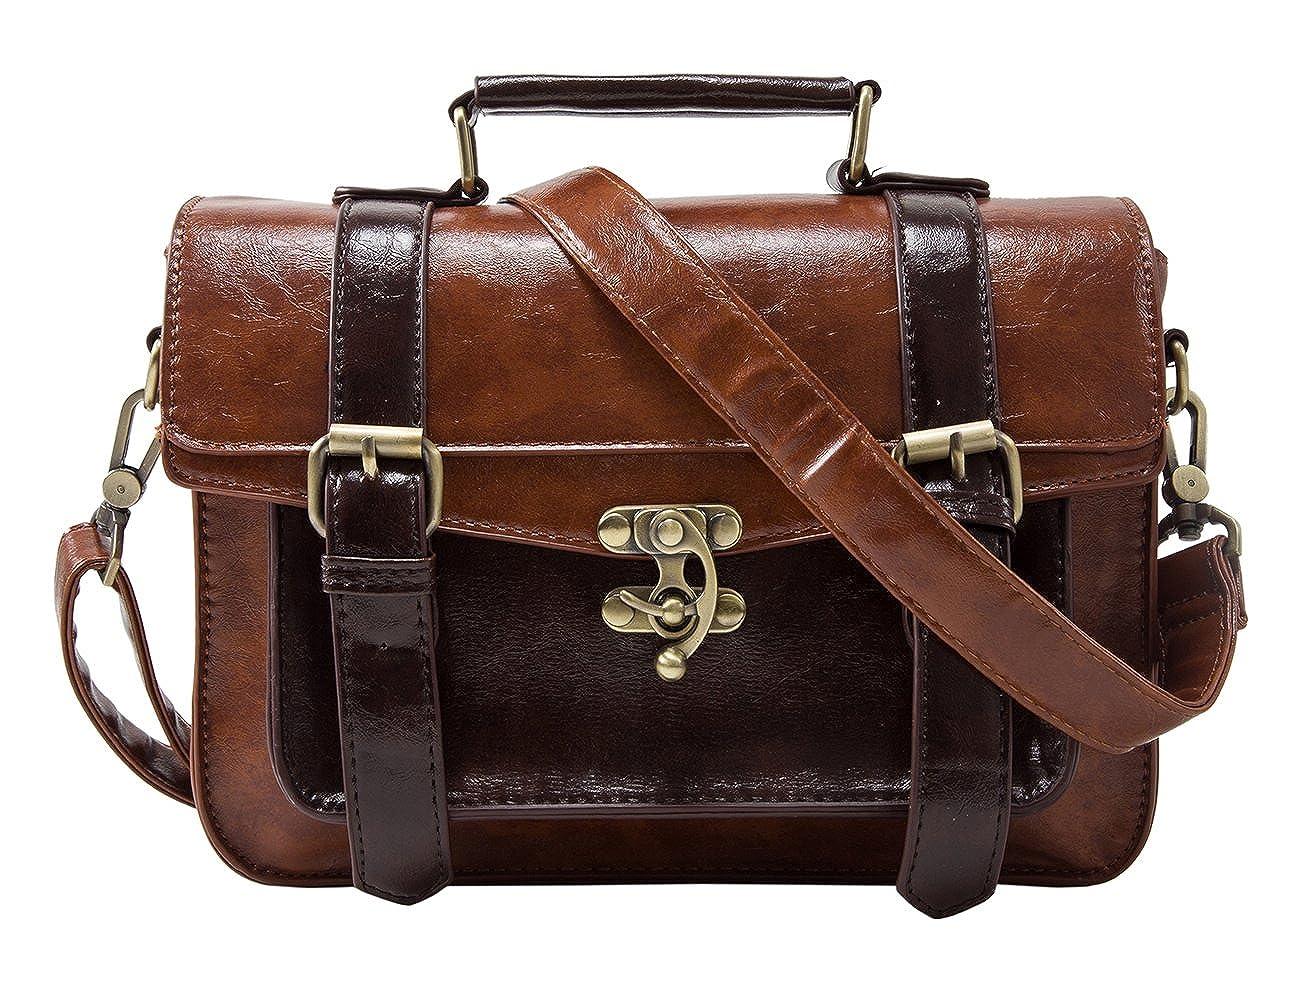 d061e054171e ECOSUSI Designer Women Vintage Messenger Bag Satchel Purse